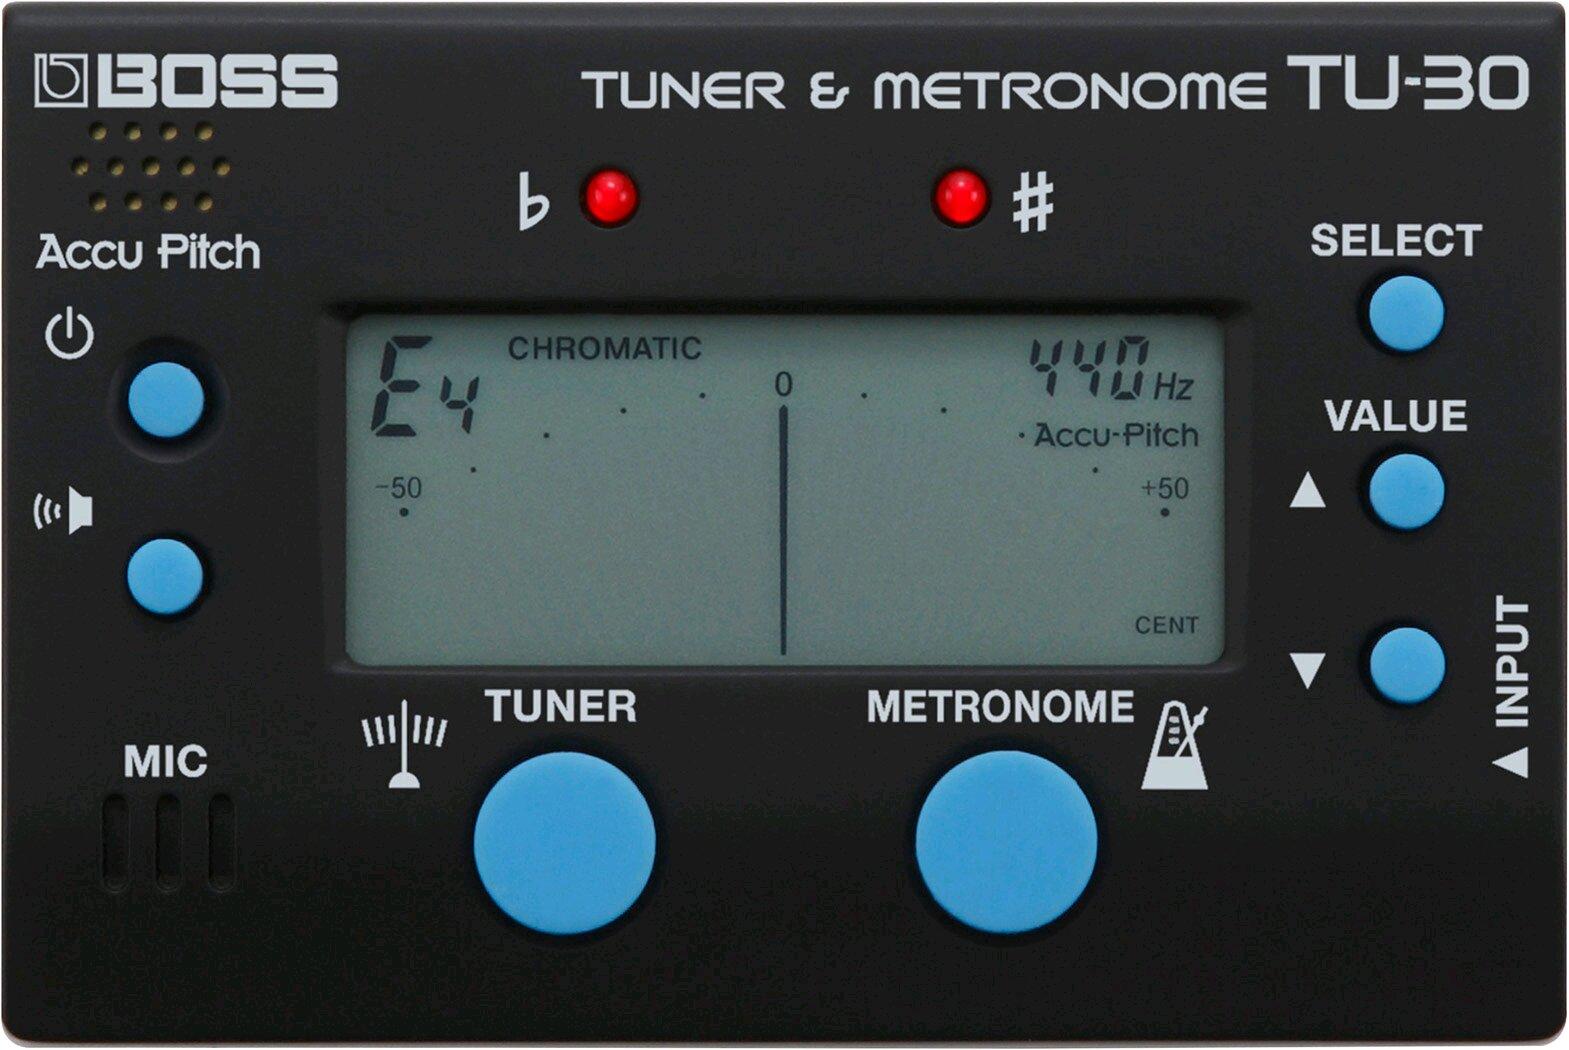 Boss TU-30 Tuner & Metronome : photo 1